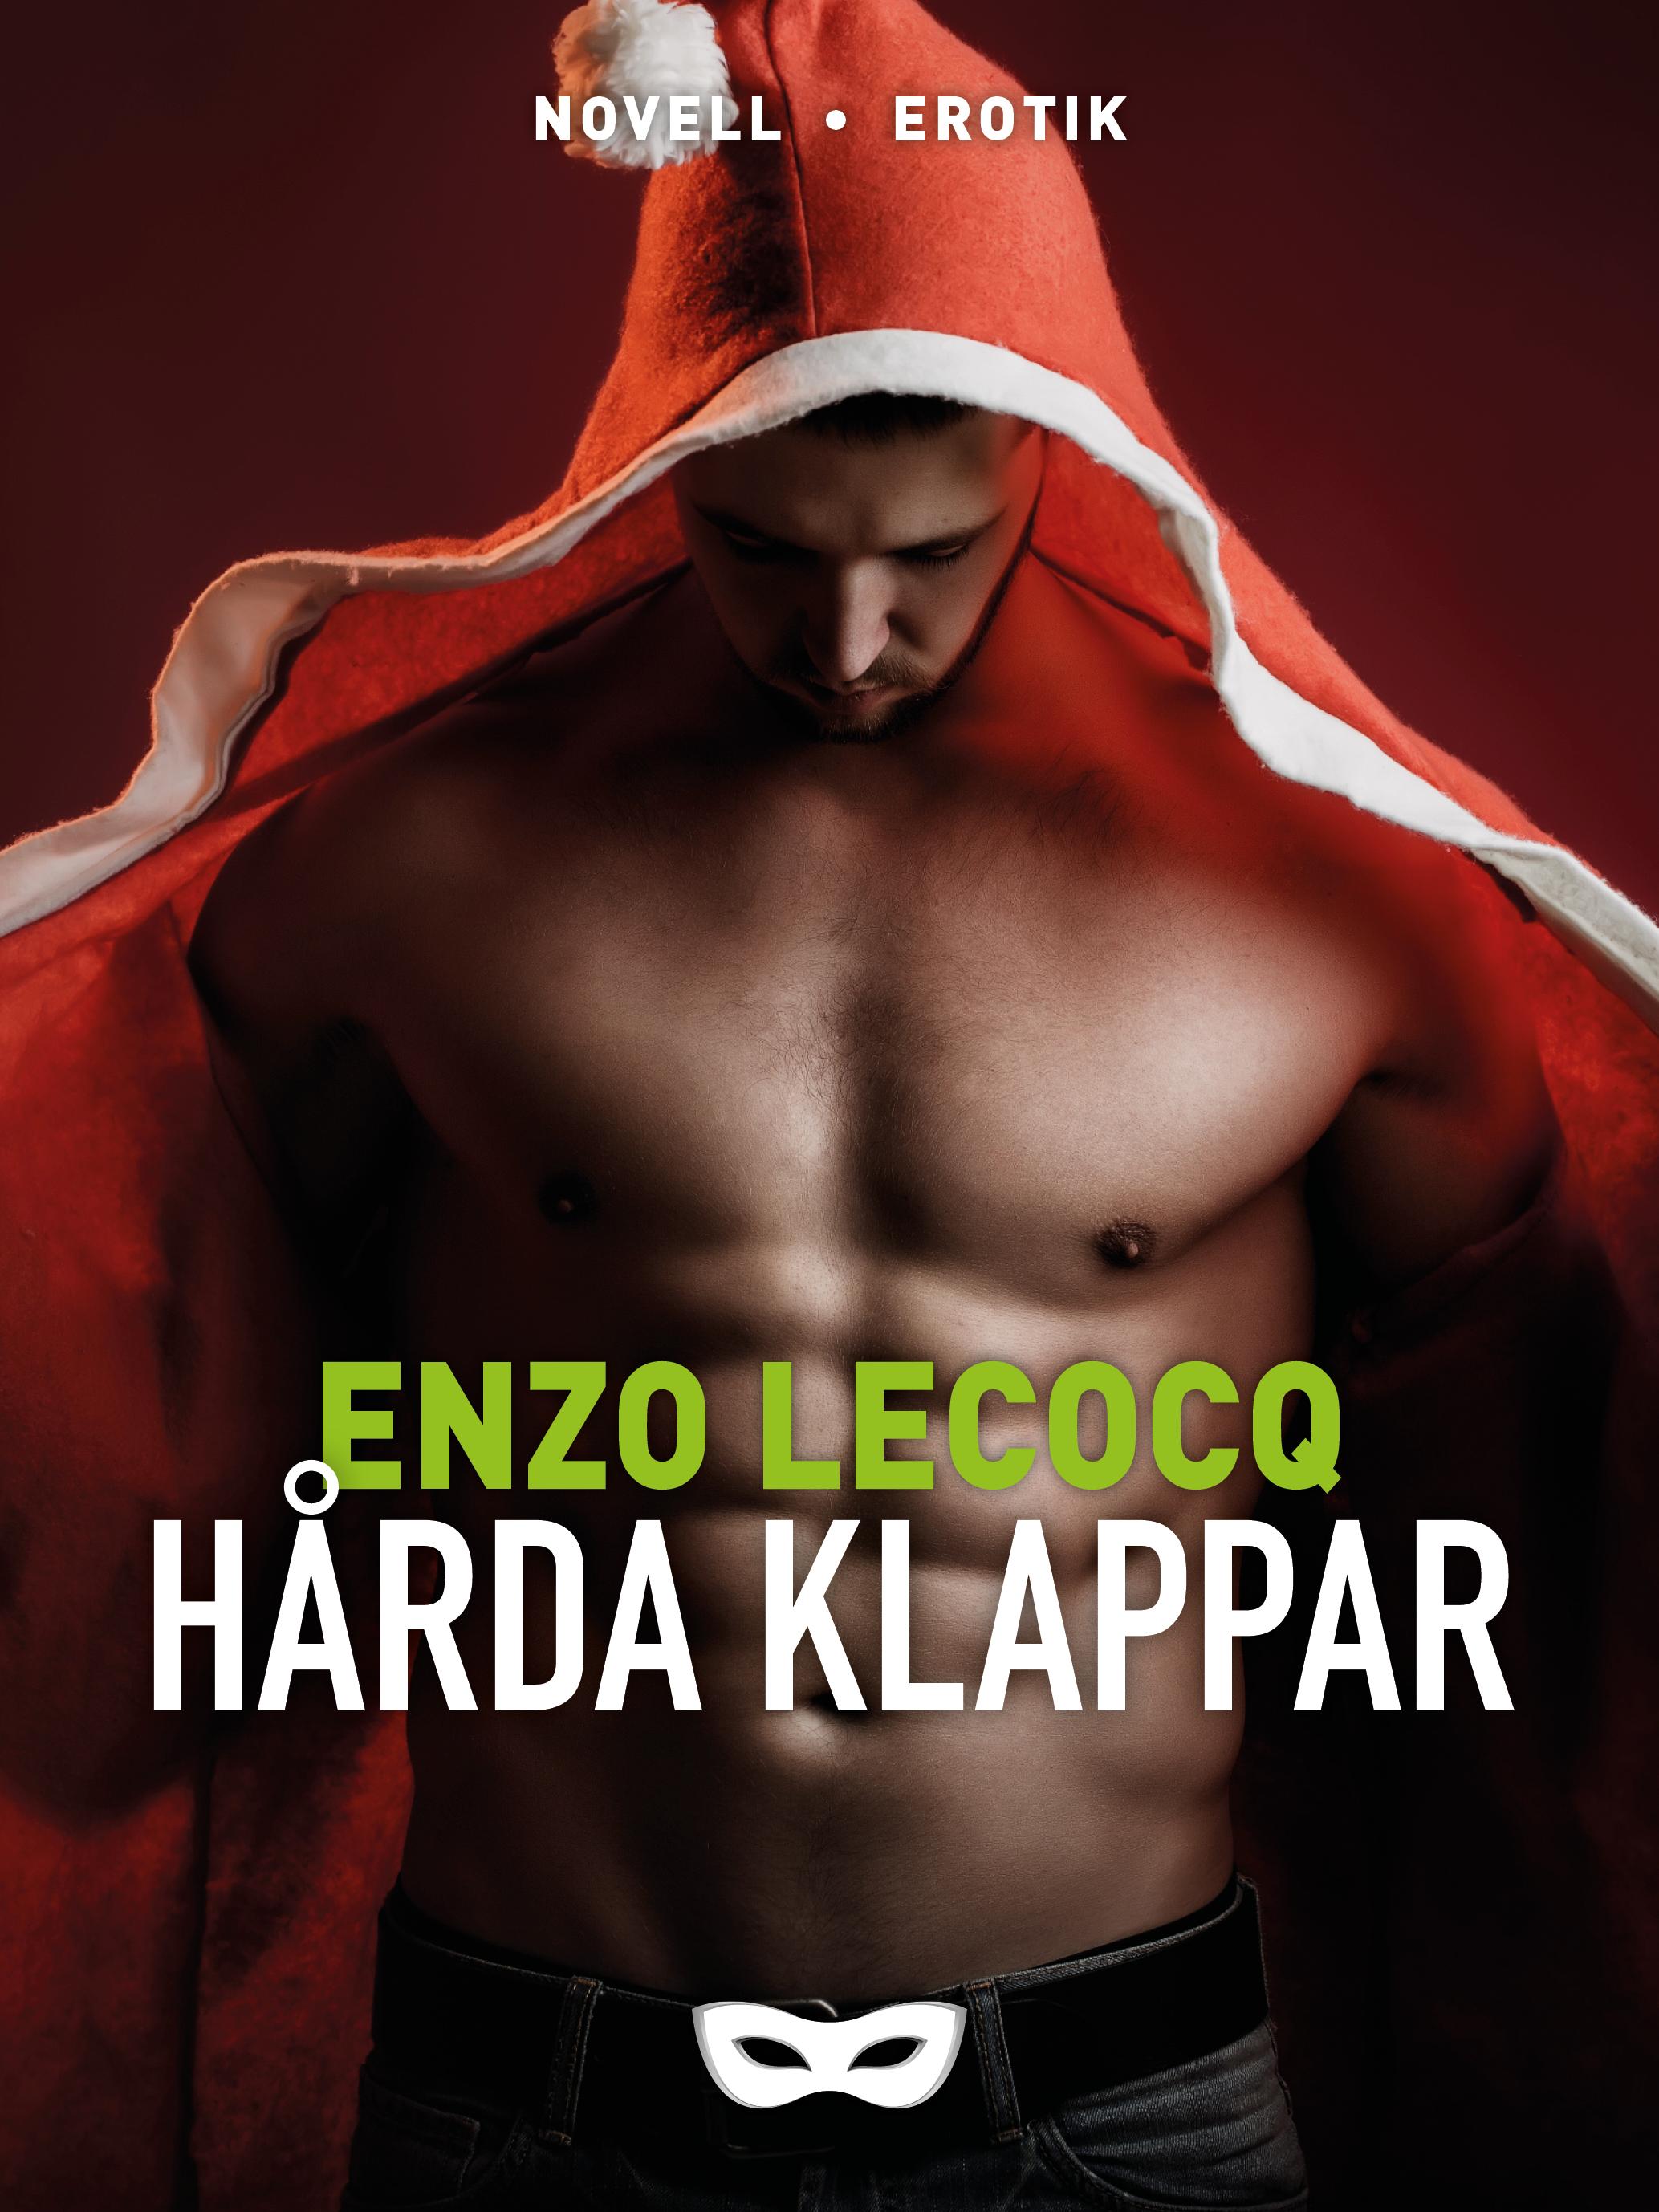 062_cover_HardaKlappar_L.jpg